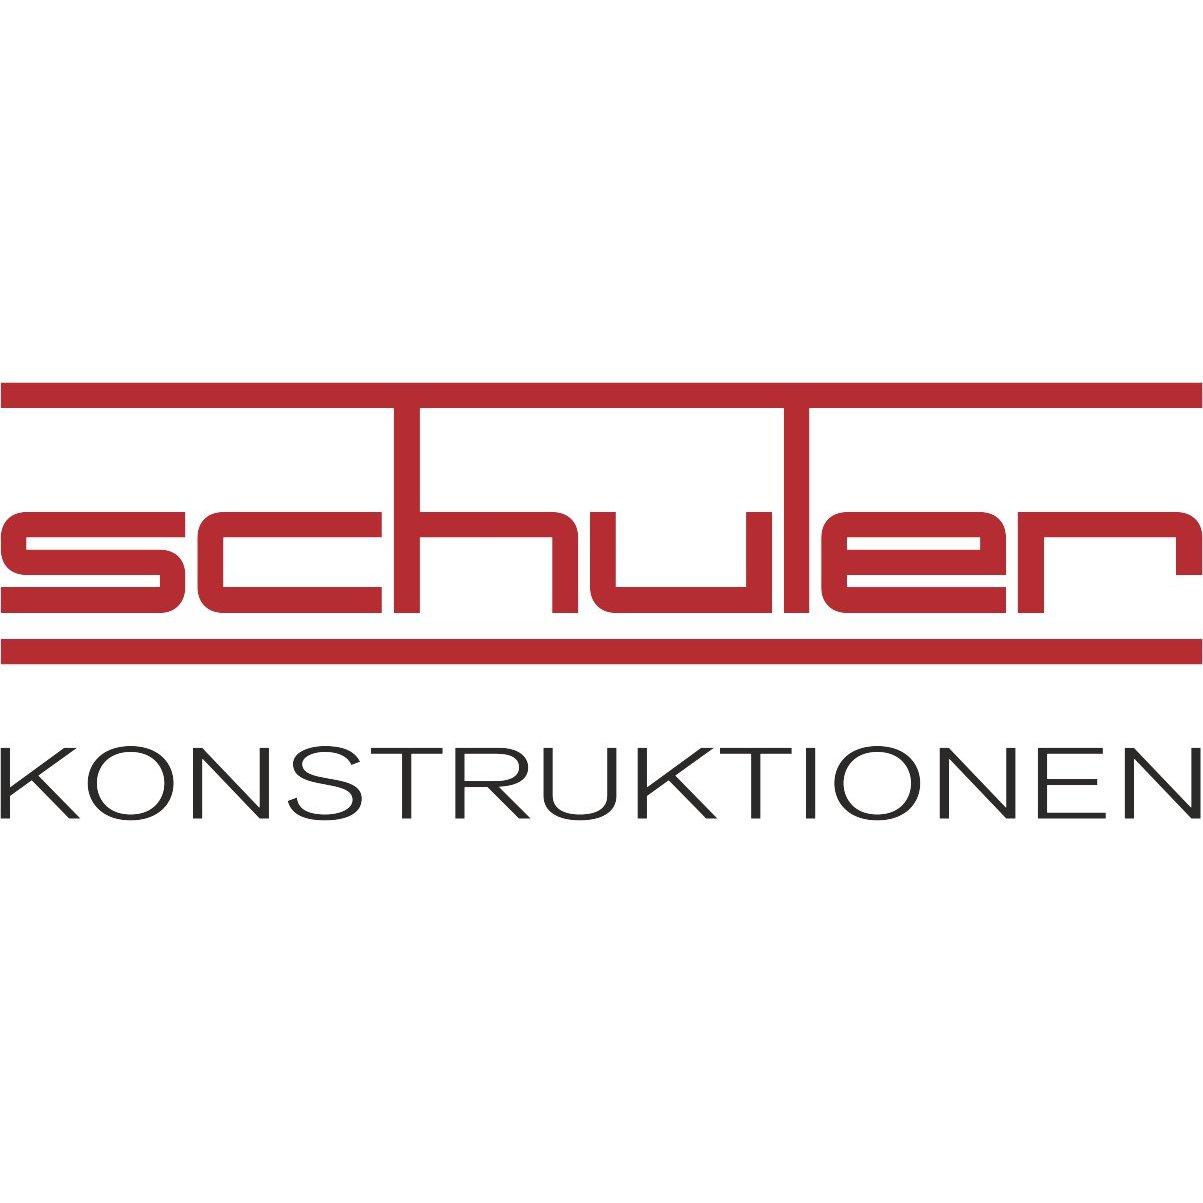 Bild zu SCHULER KONSTRUKTIONEN GmbH & Co. KG - Standort Berlin in Berlin